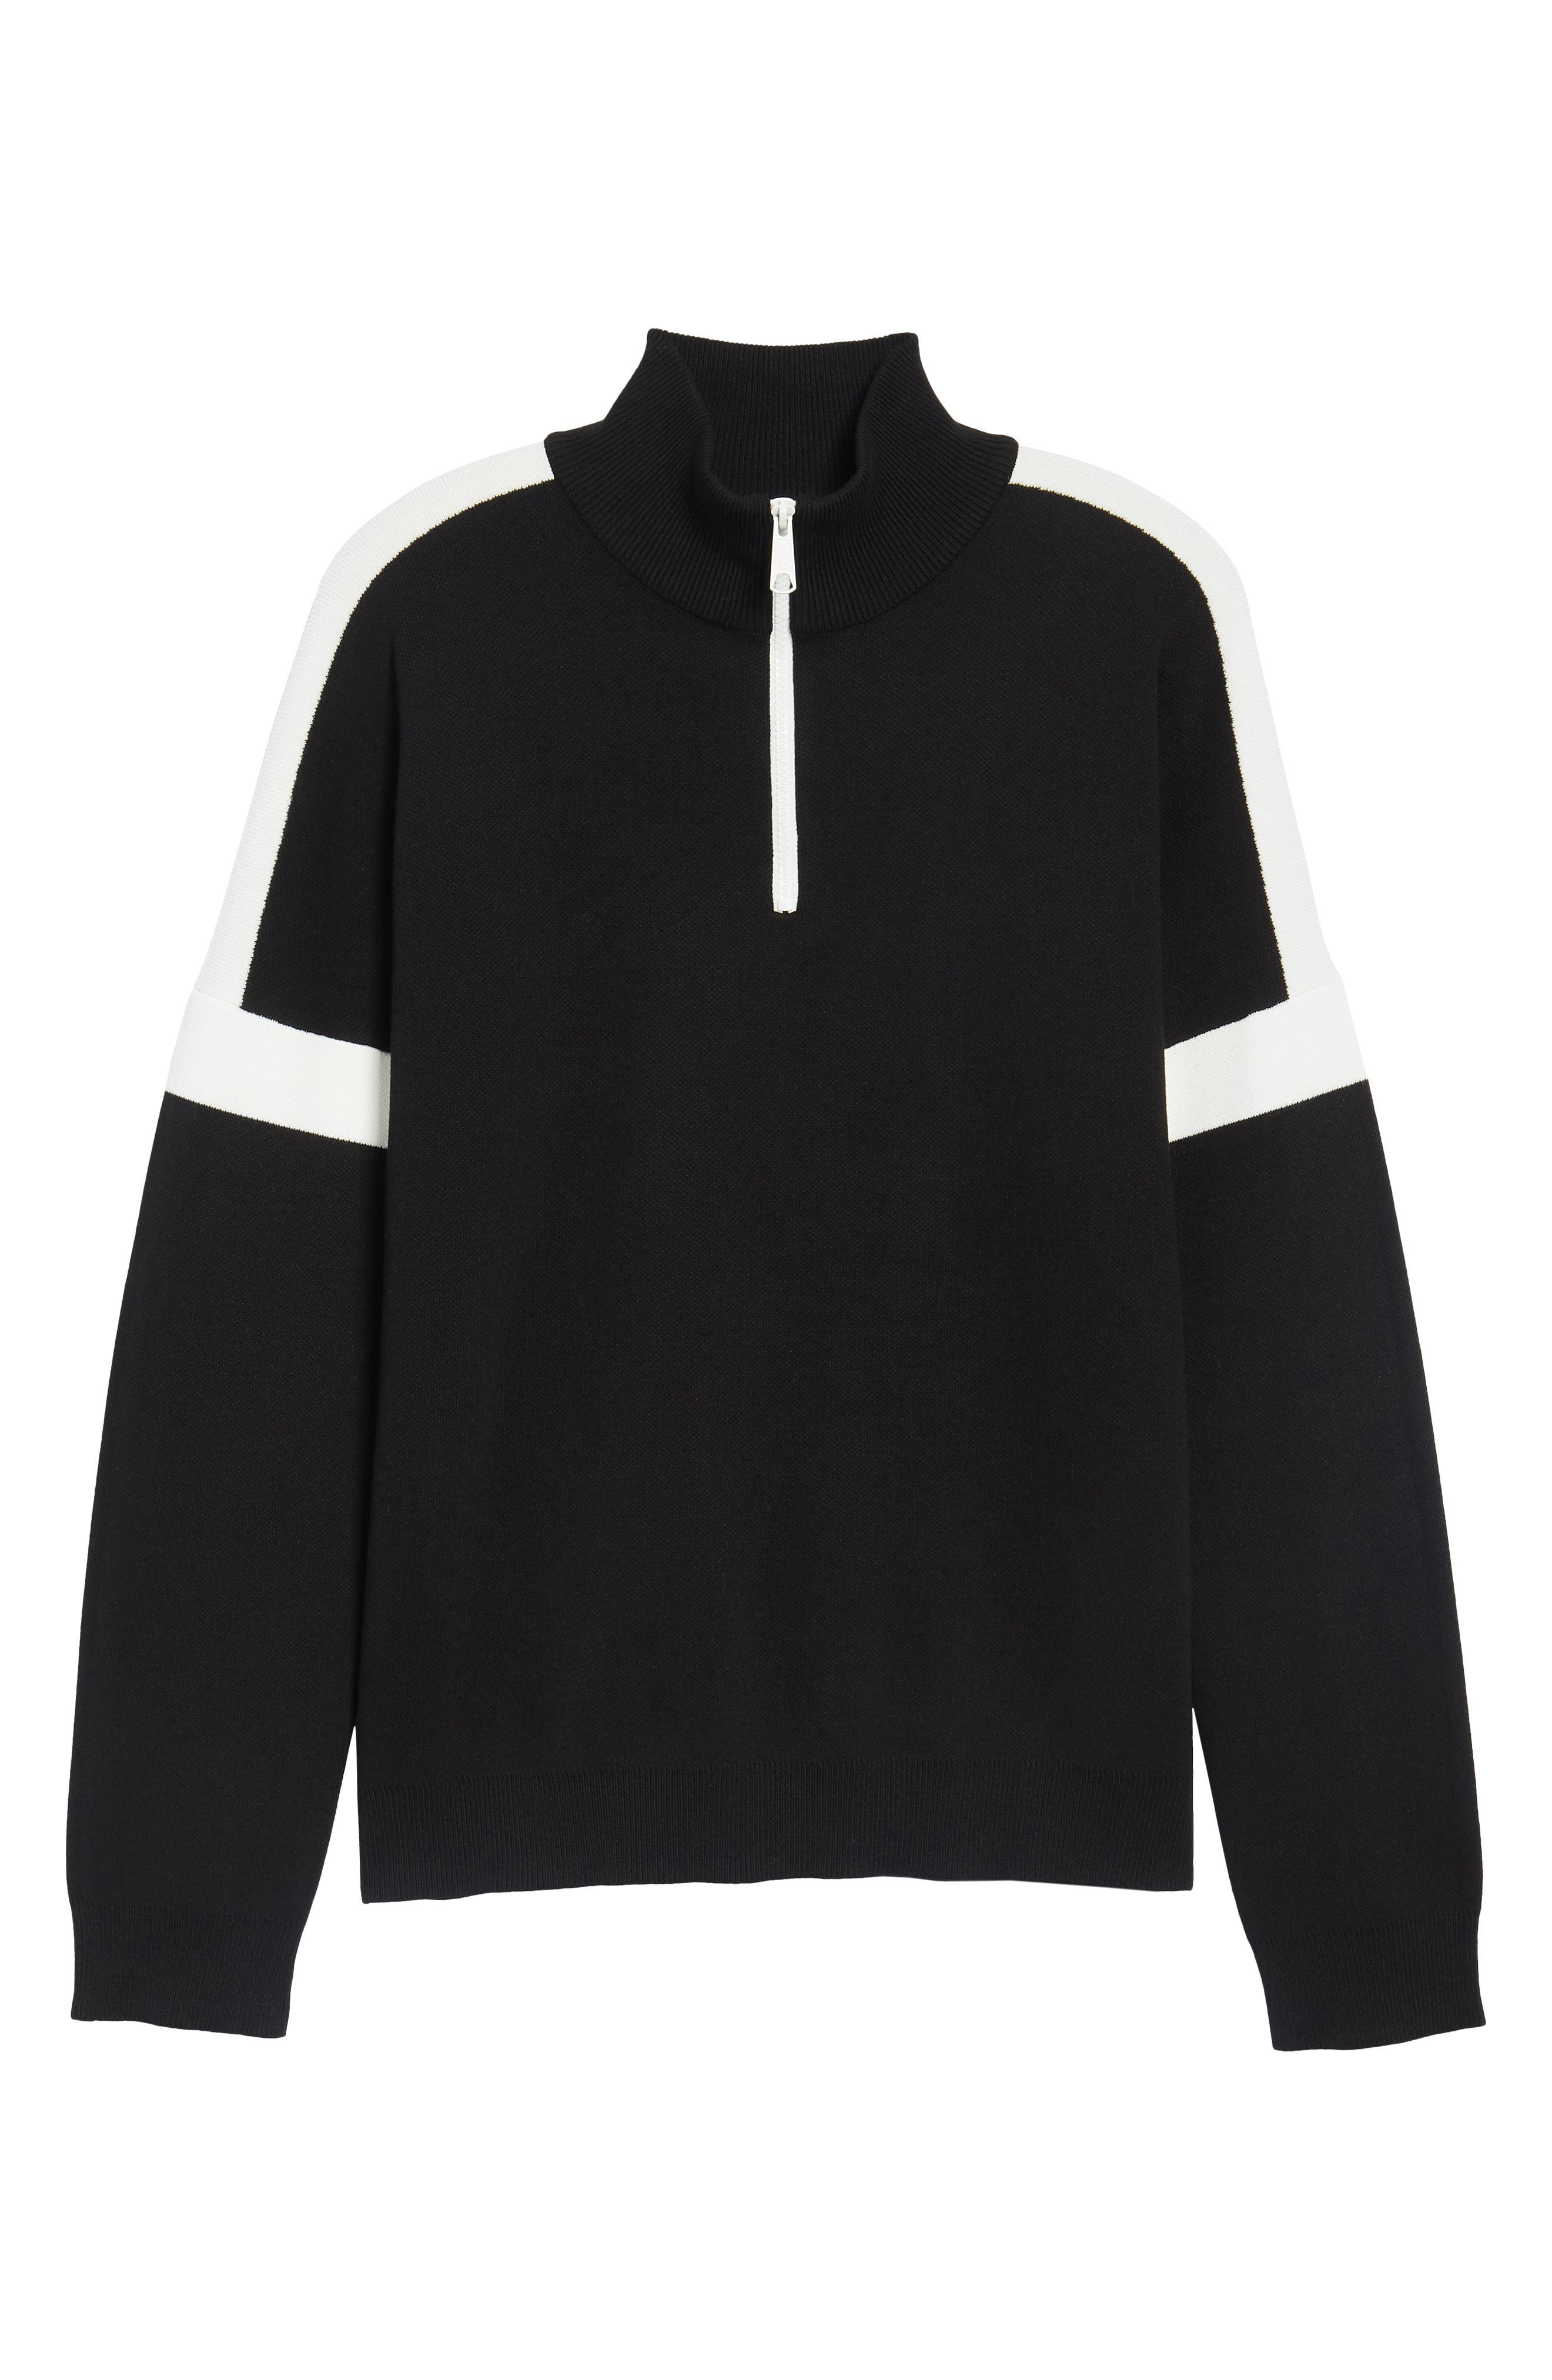 Lakra Regular Fit Half Zip Pullover,                             Alternate thumbnail 6, color,                             Black/Milk/Black